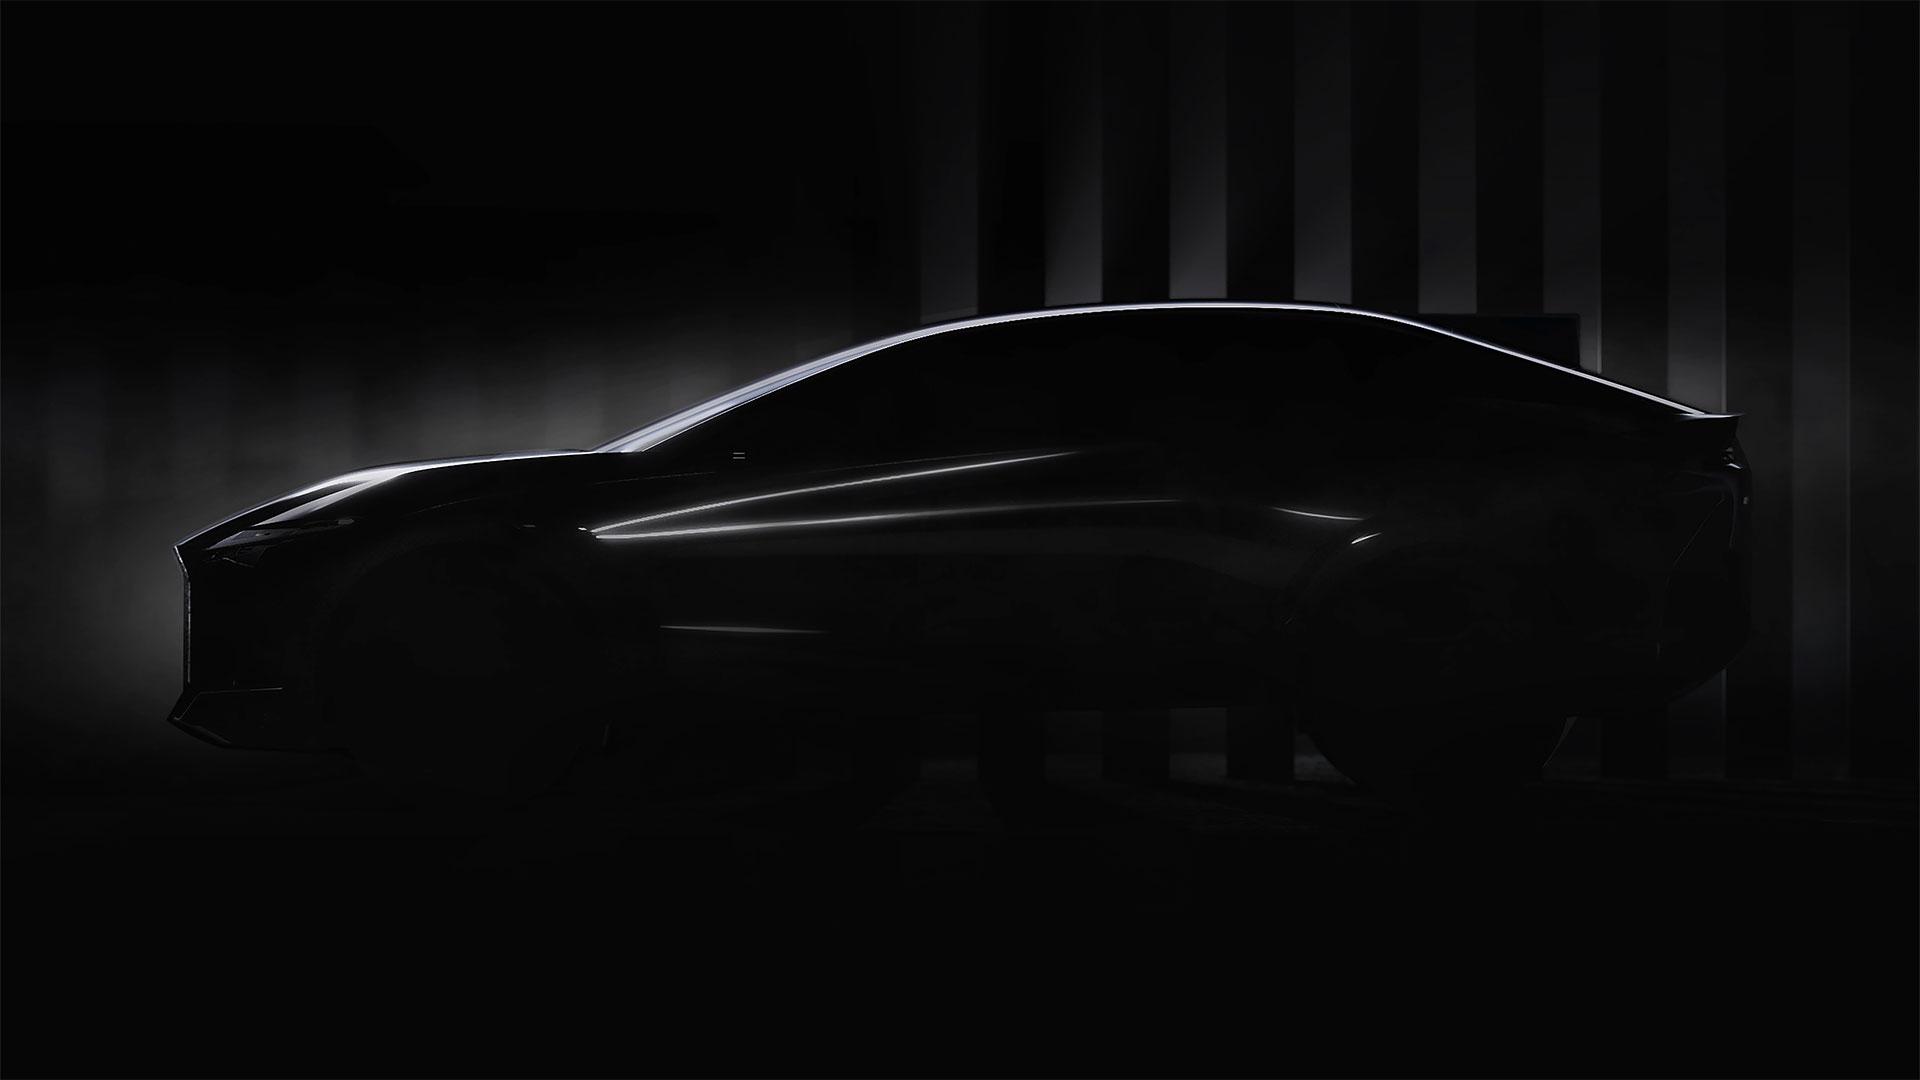 2021 lexus concept car gallery 03